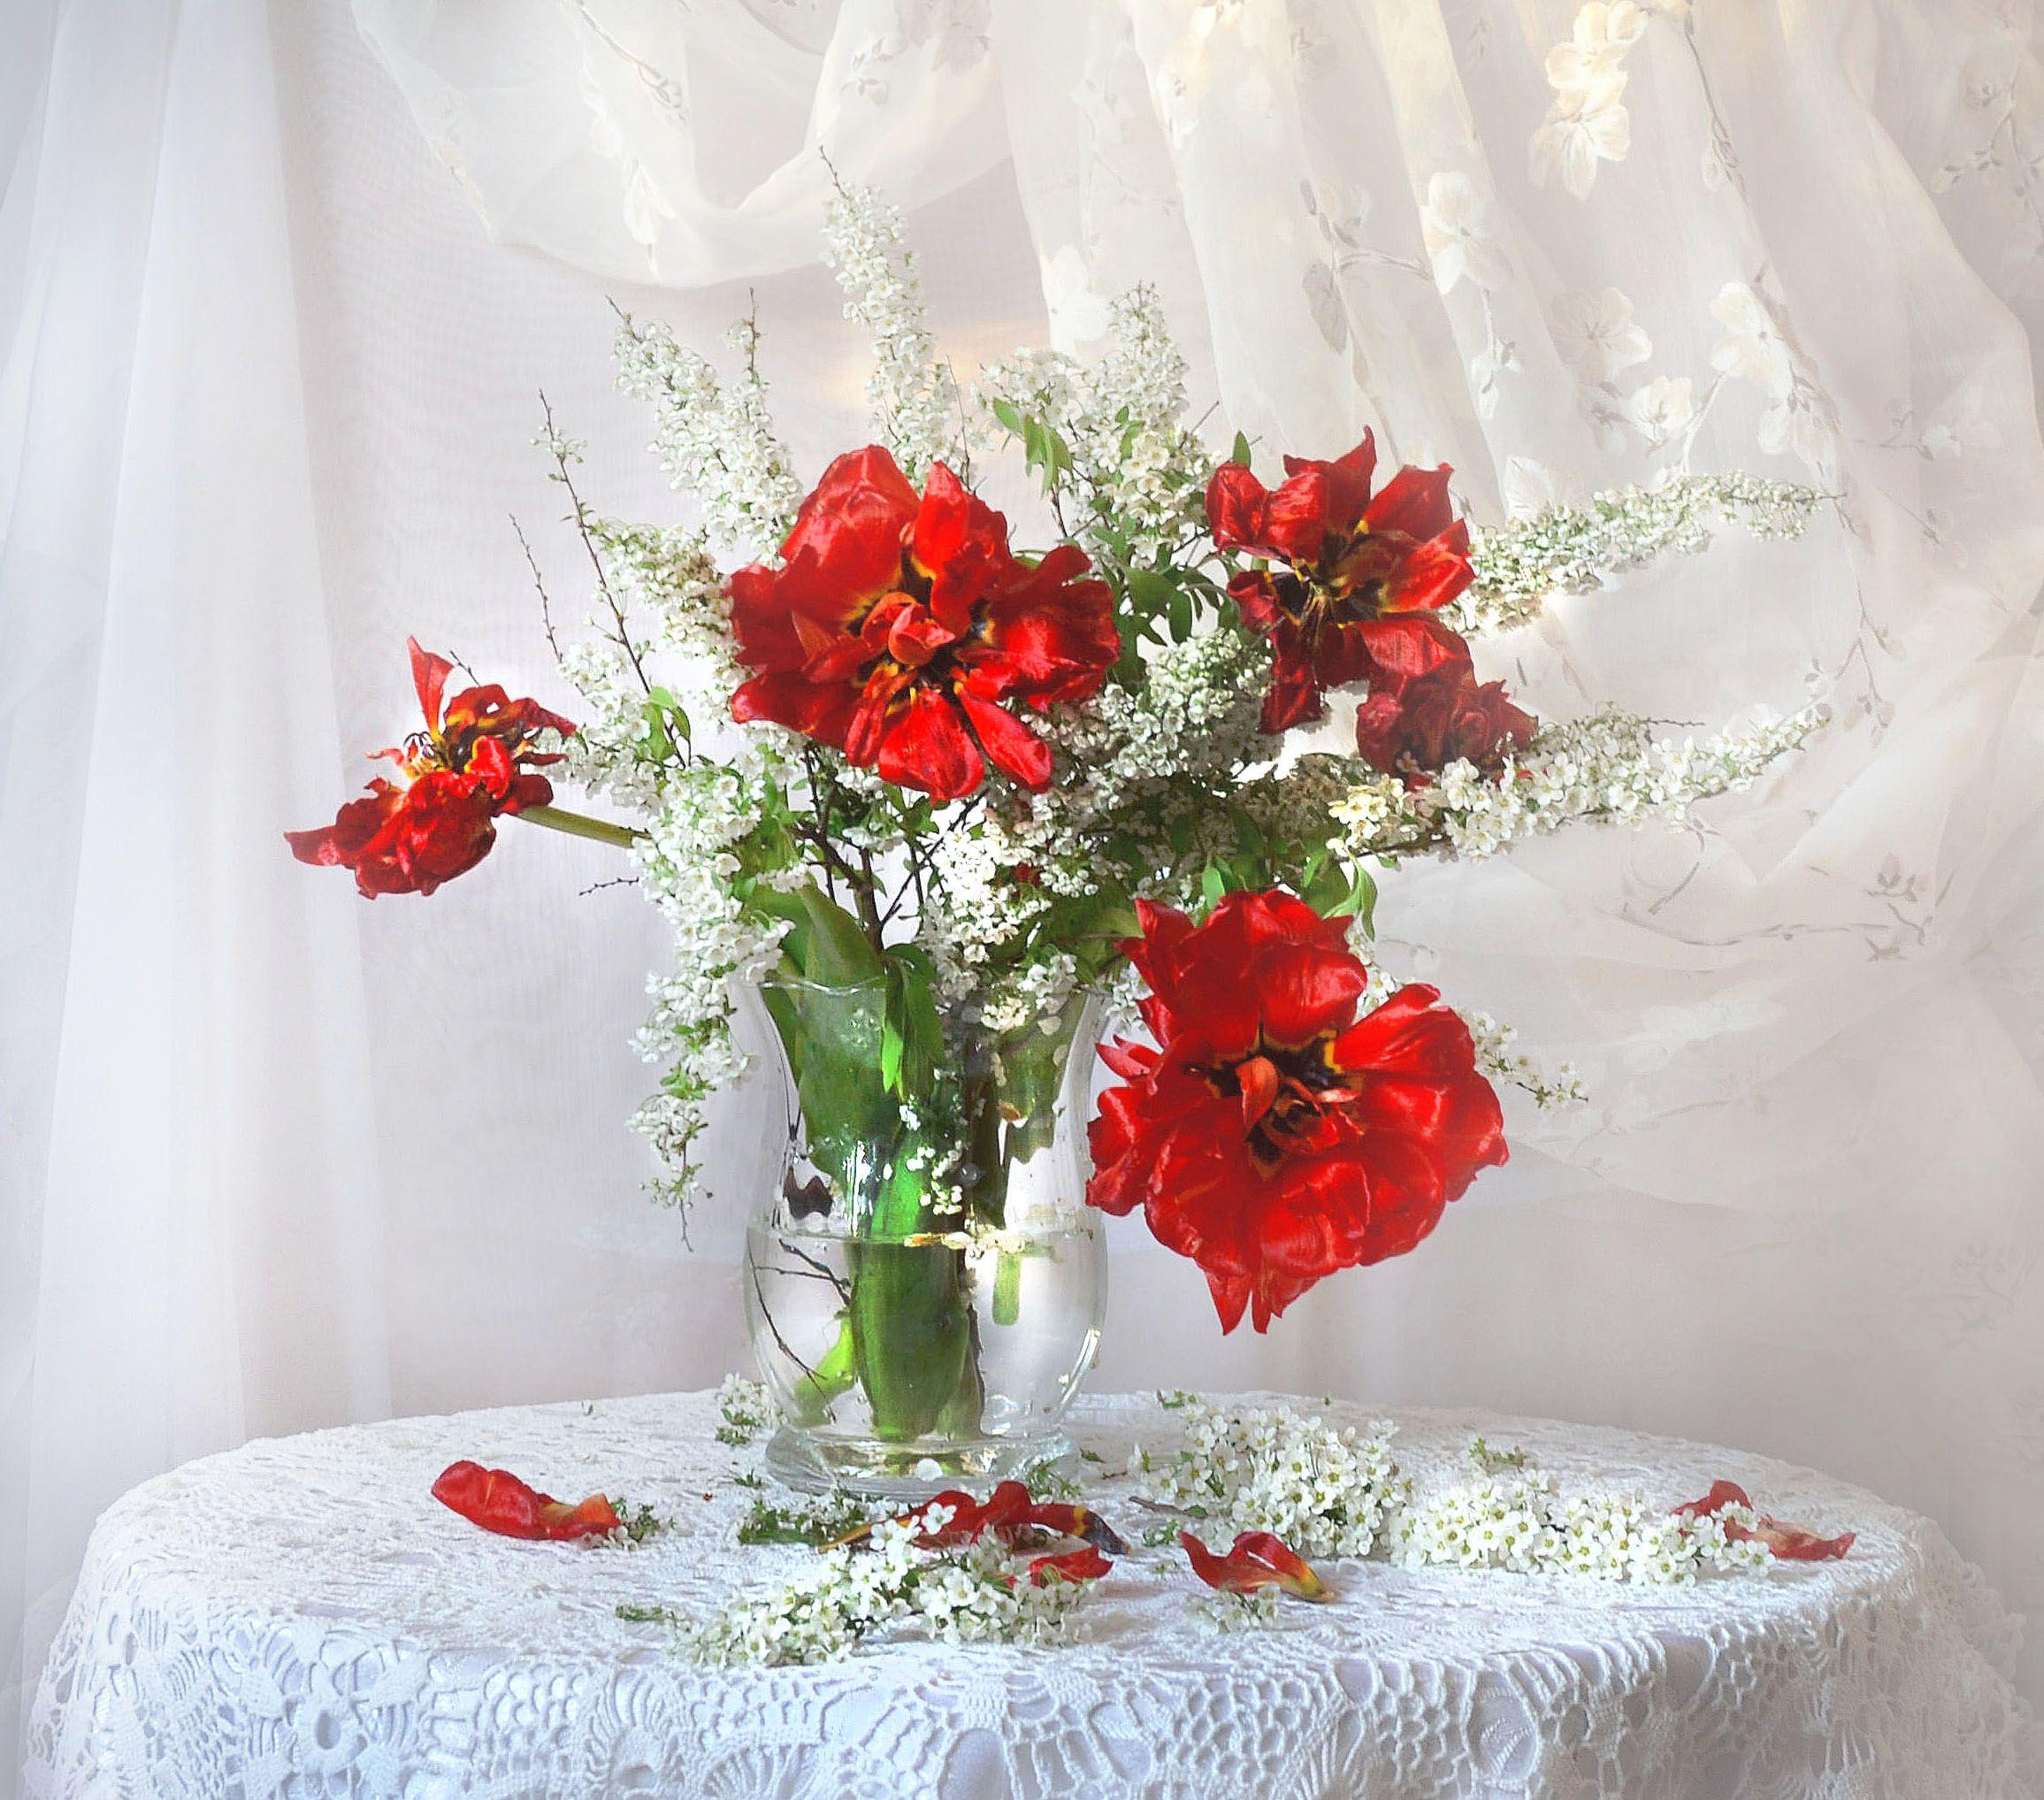 still life, натюрморт, весна, май, спирея, тюльпаны, фото натюрморт, цветы, Колова Валентина